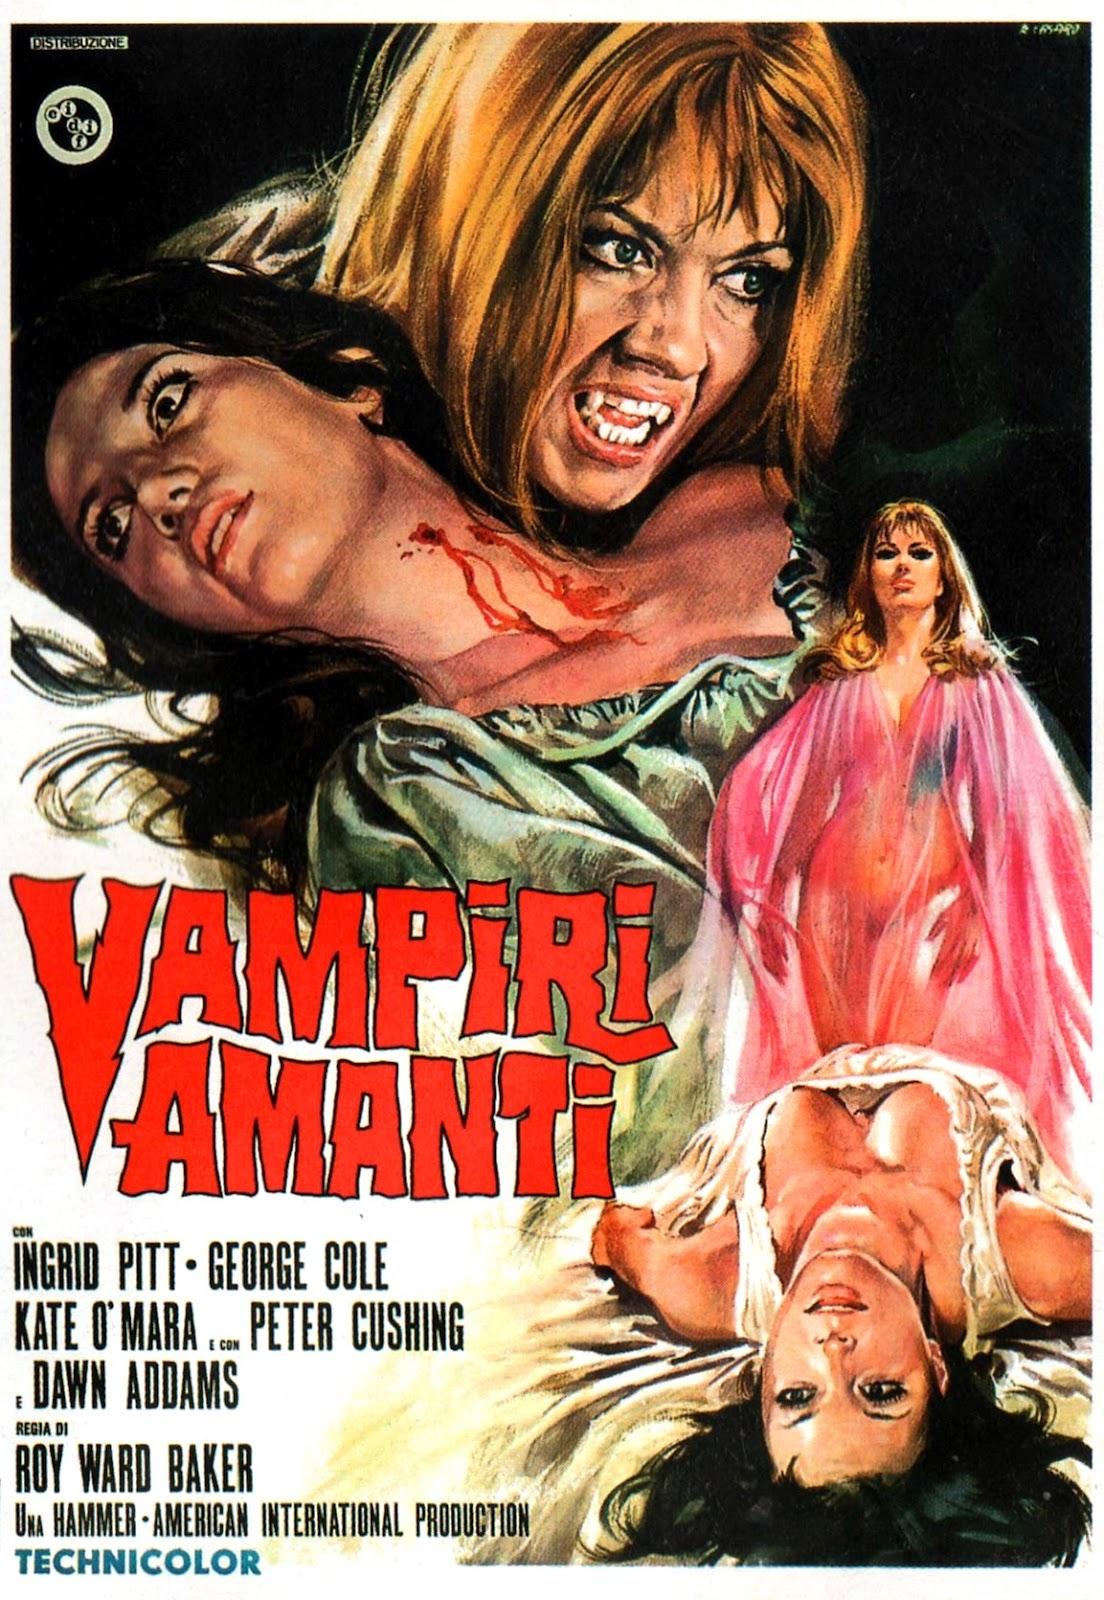 Смотреть онлайн vampyre lovers 2010 dvdrip 2 фотография